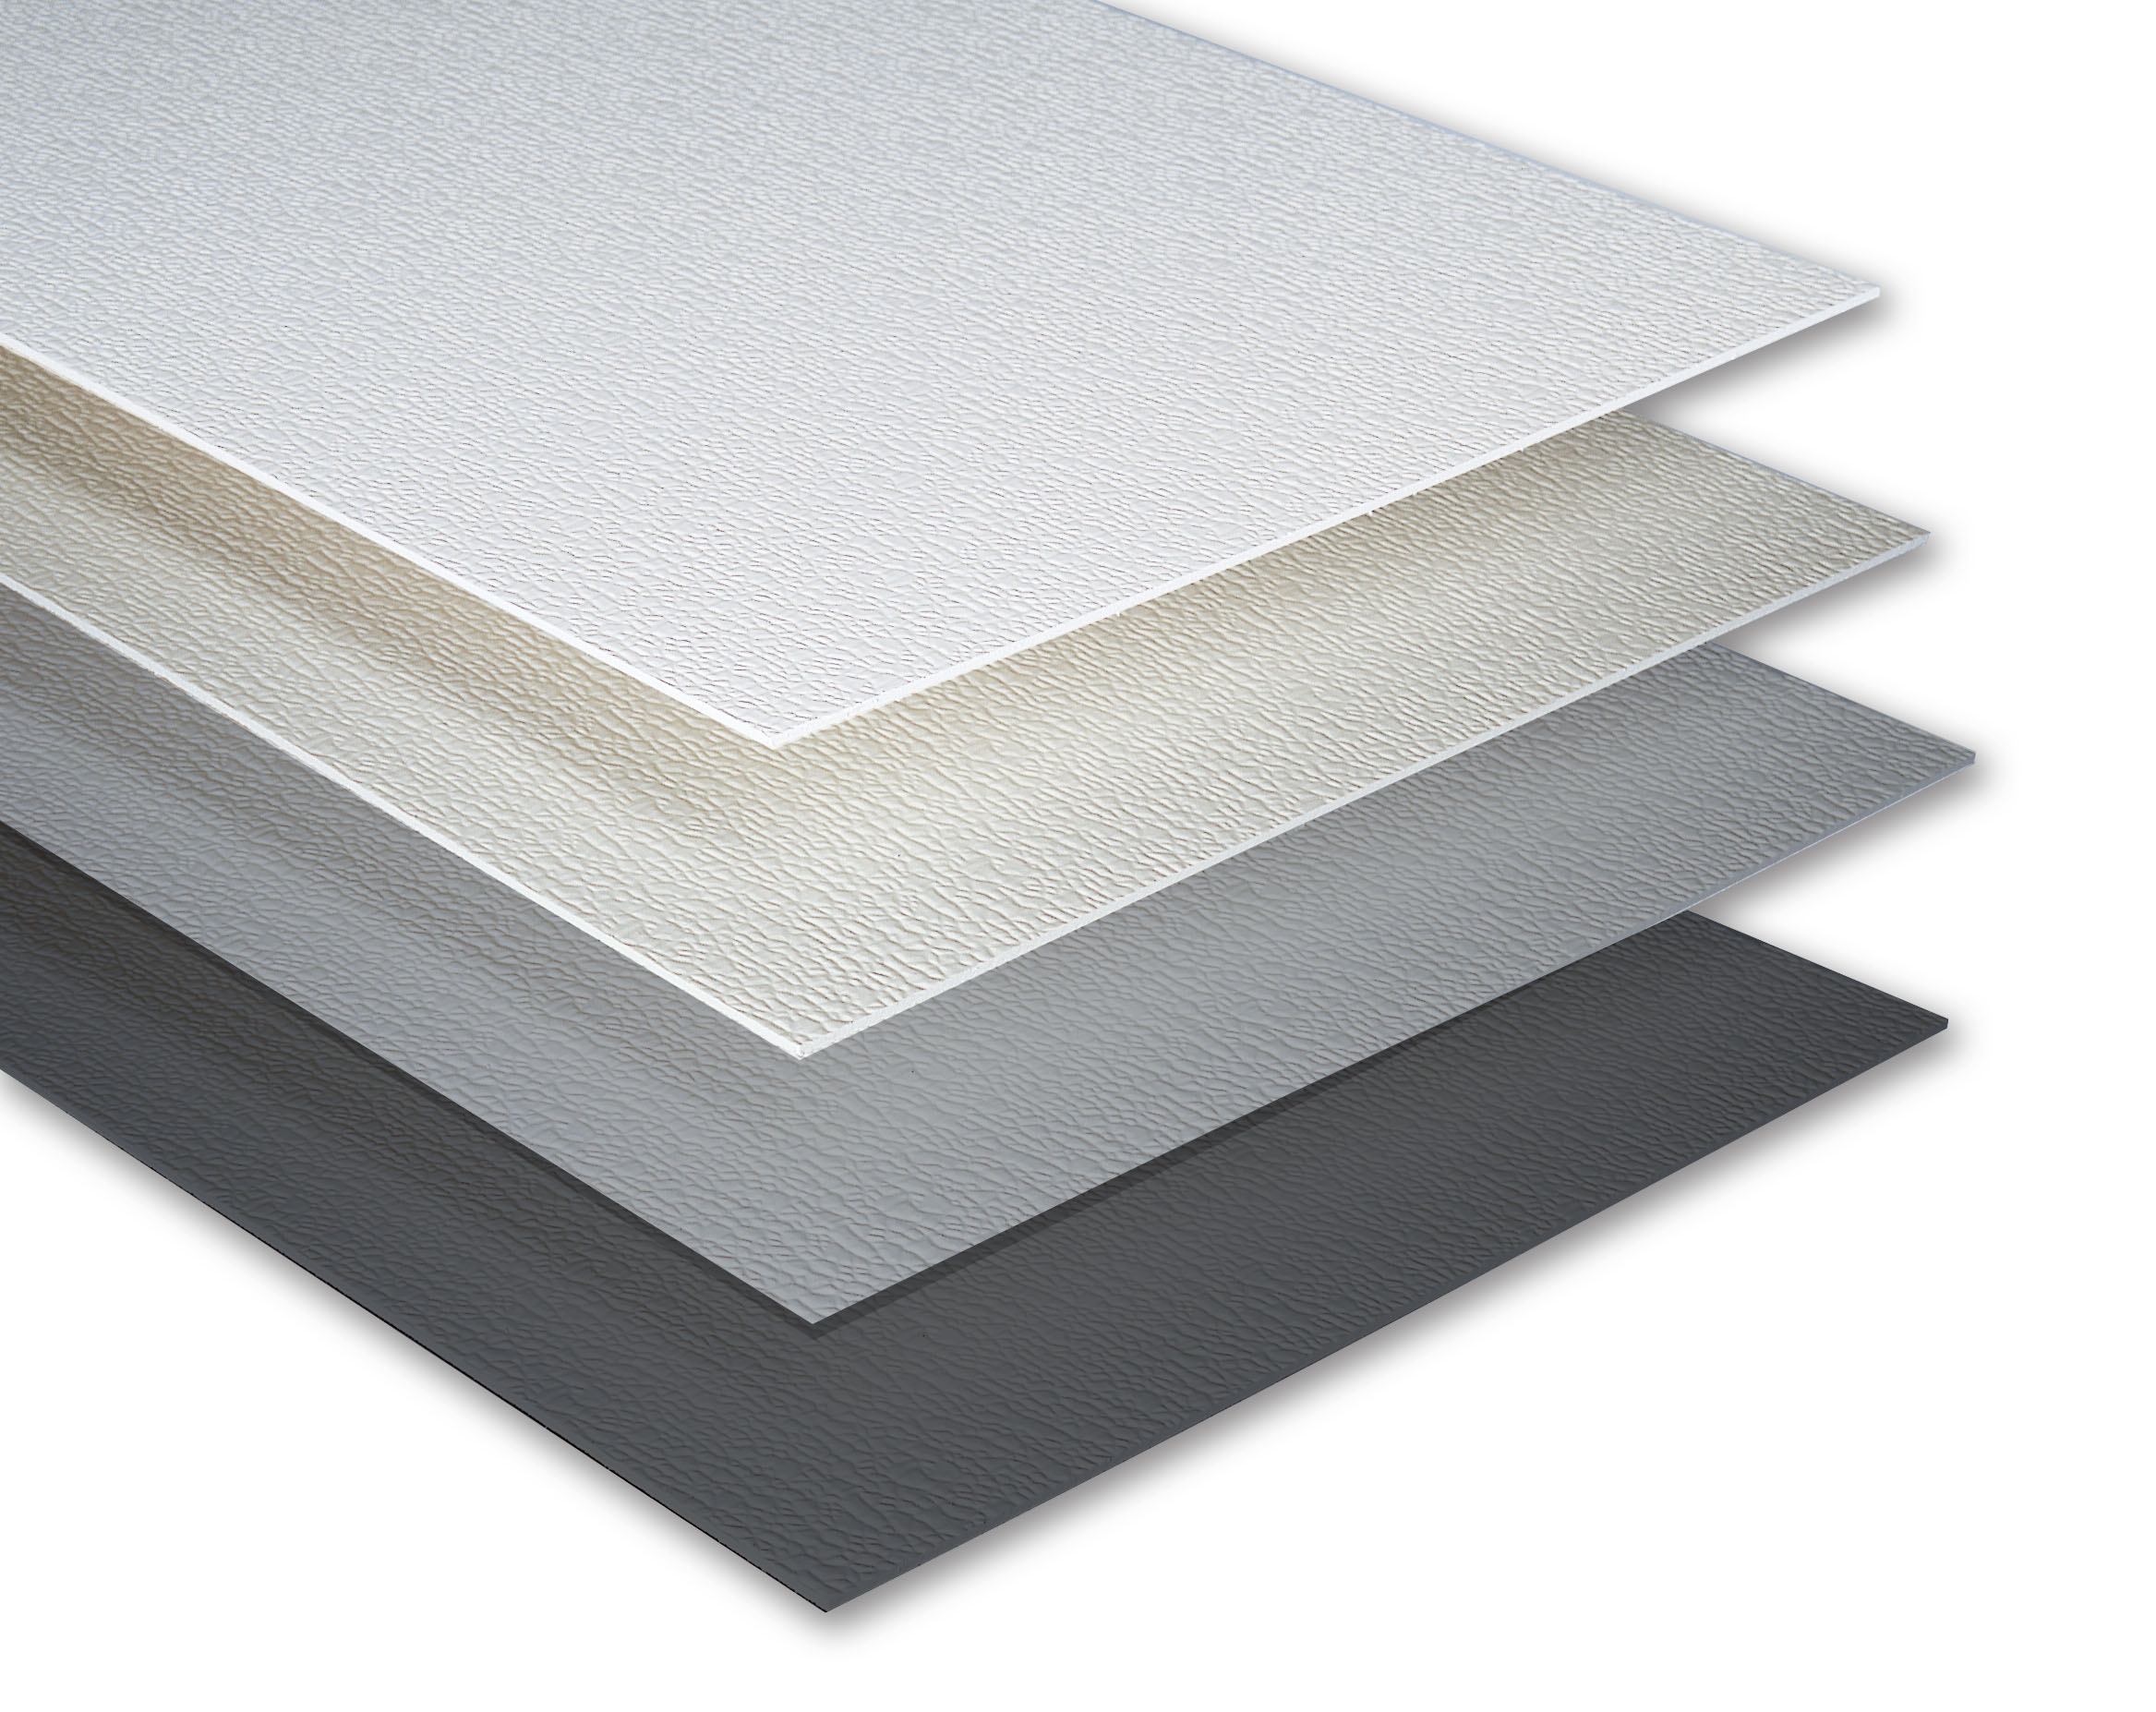 FRP(Fiber Reinforced Plastics)って何?塗装・ペイントや防水に使うとどんな良いことがあるの?